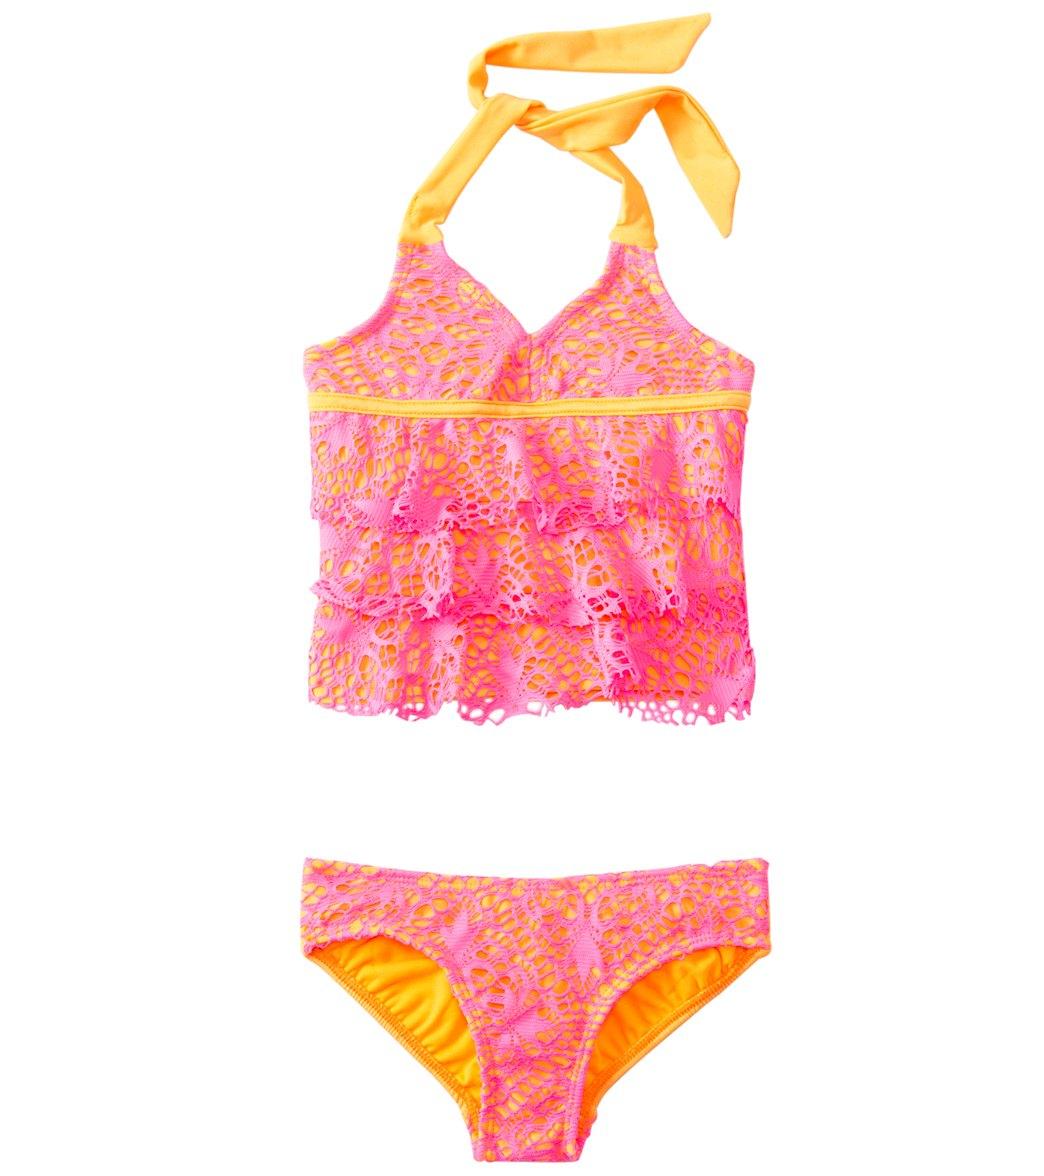 3221ef5e14c Kensie Girl Ibiza Crochet Ruffle Tankini Two Piece Set (7yrs-14yrs) at  SwimOutlet.com